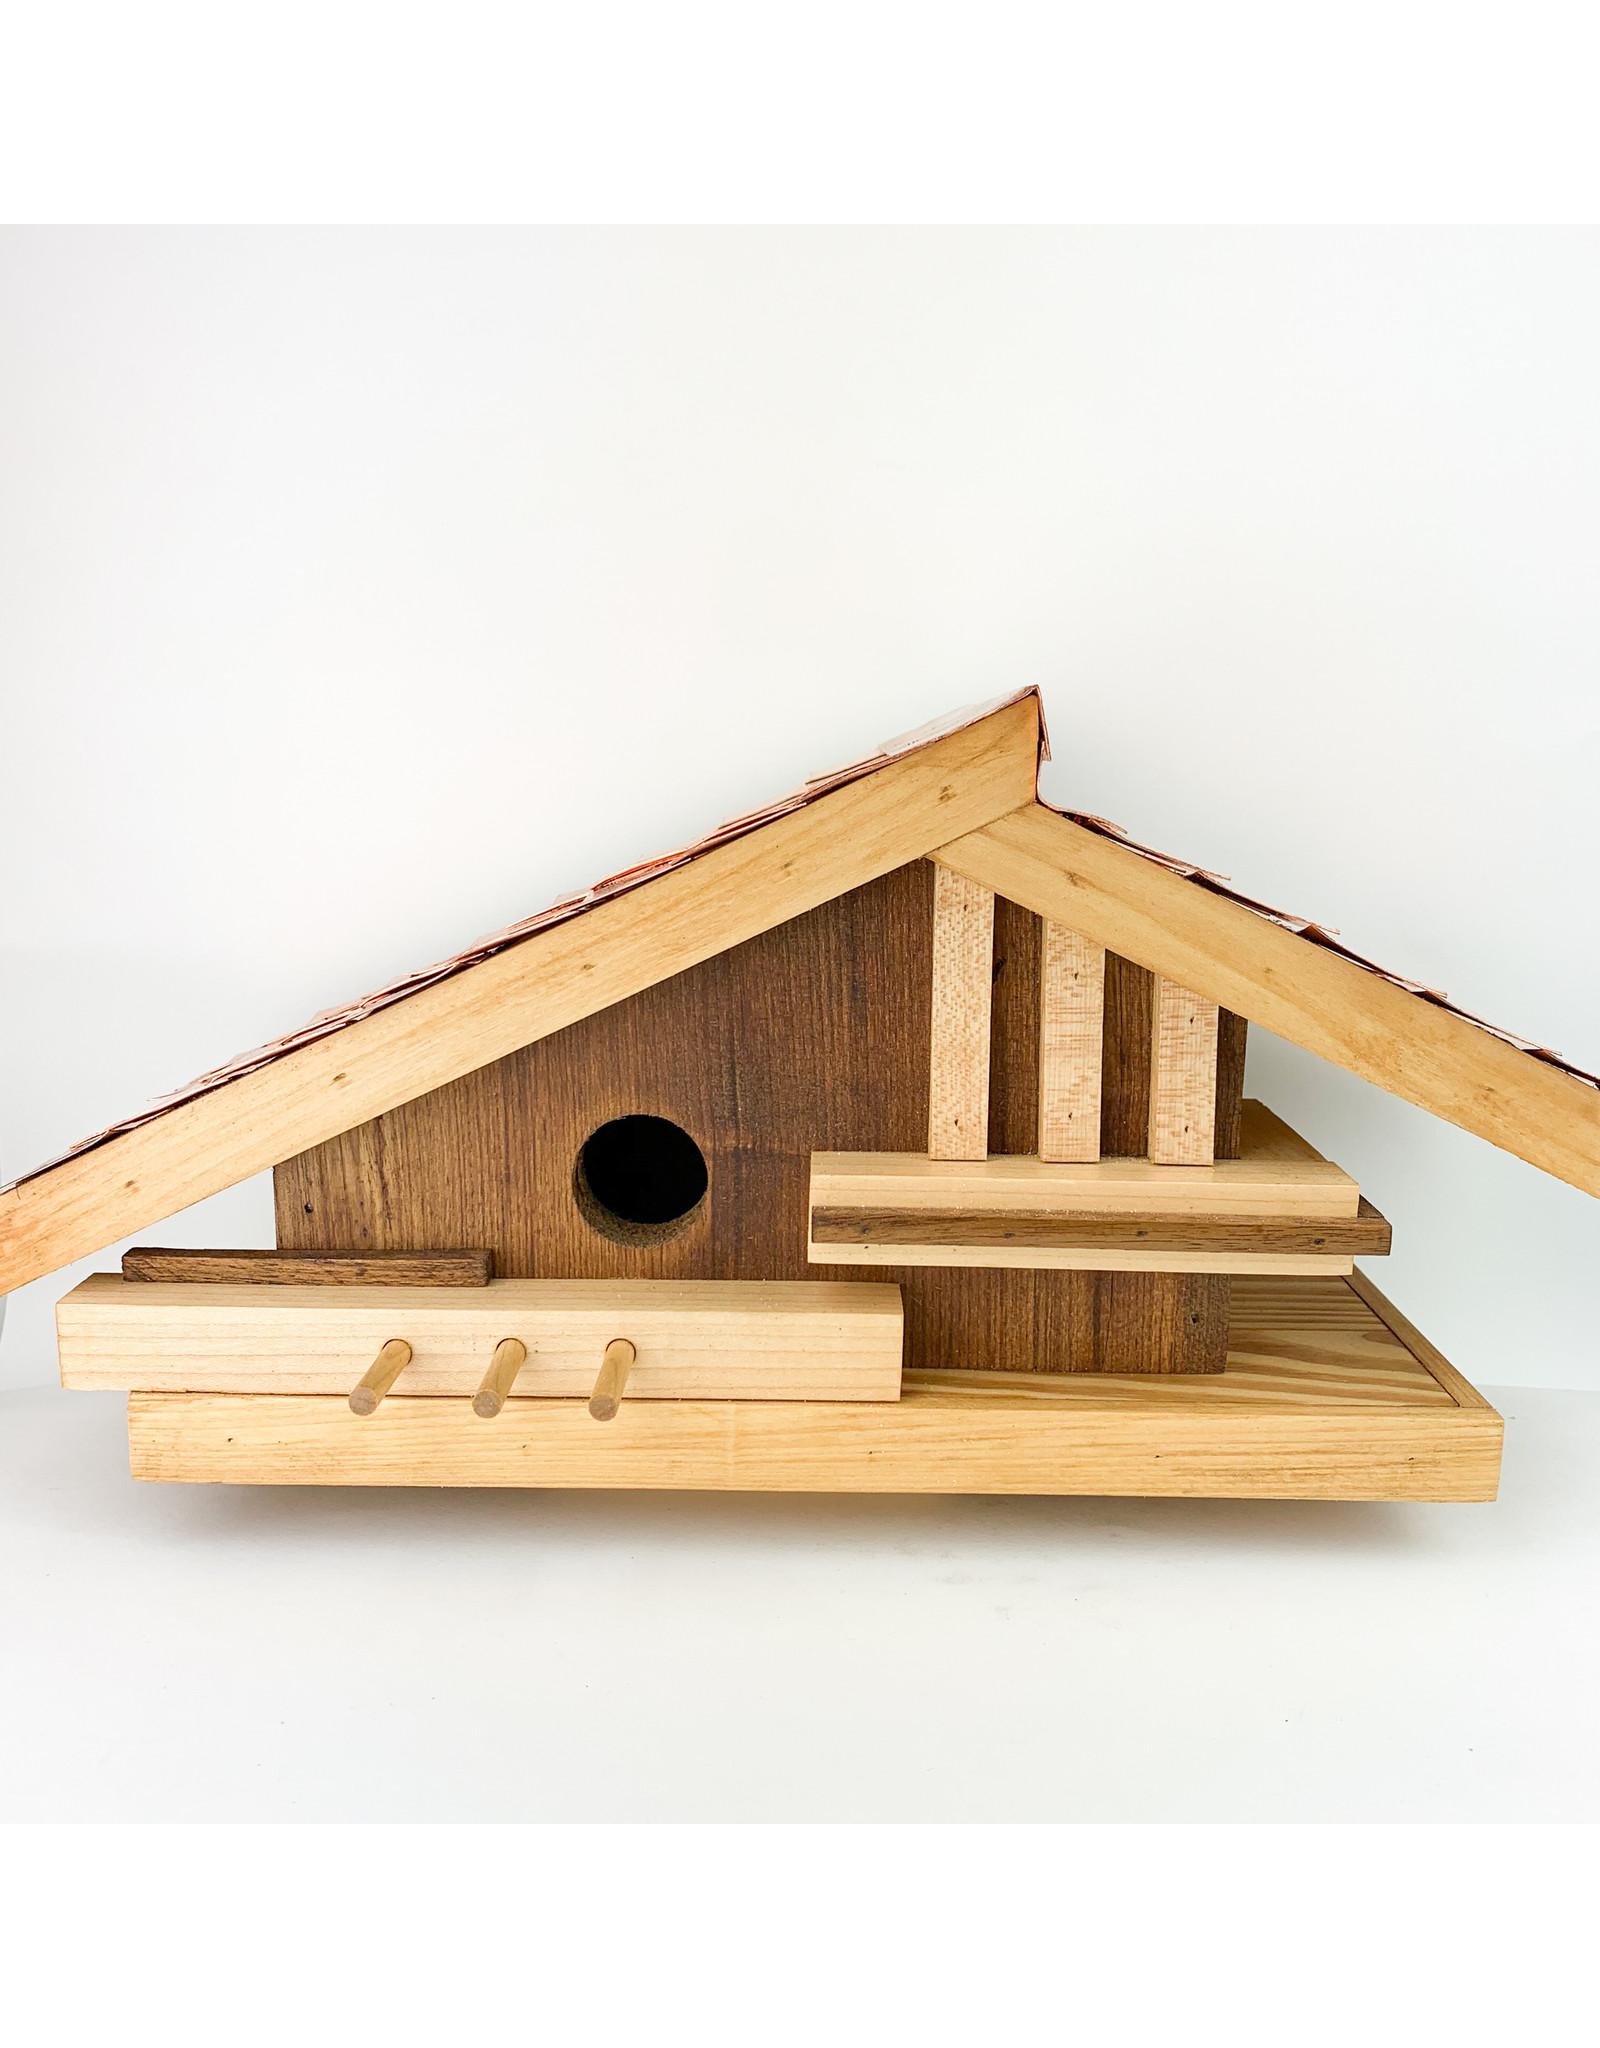 John Posl - consignment Mid-Century Modern Birdhouse Consignment